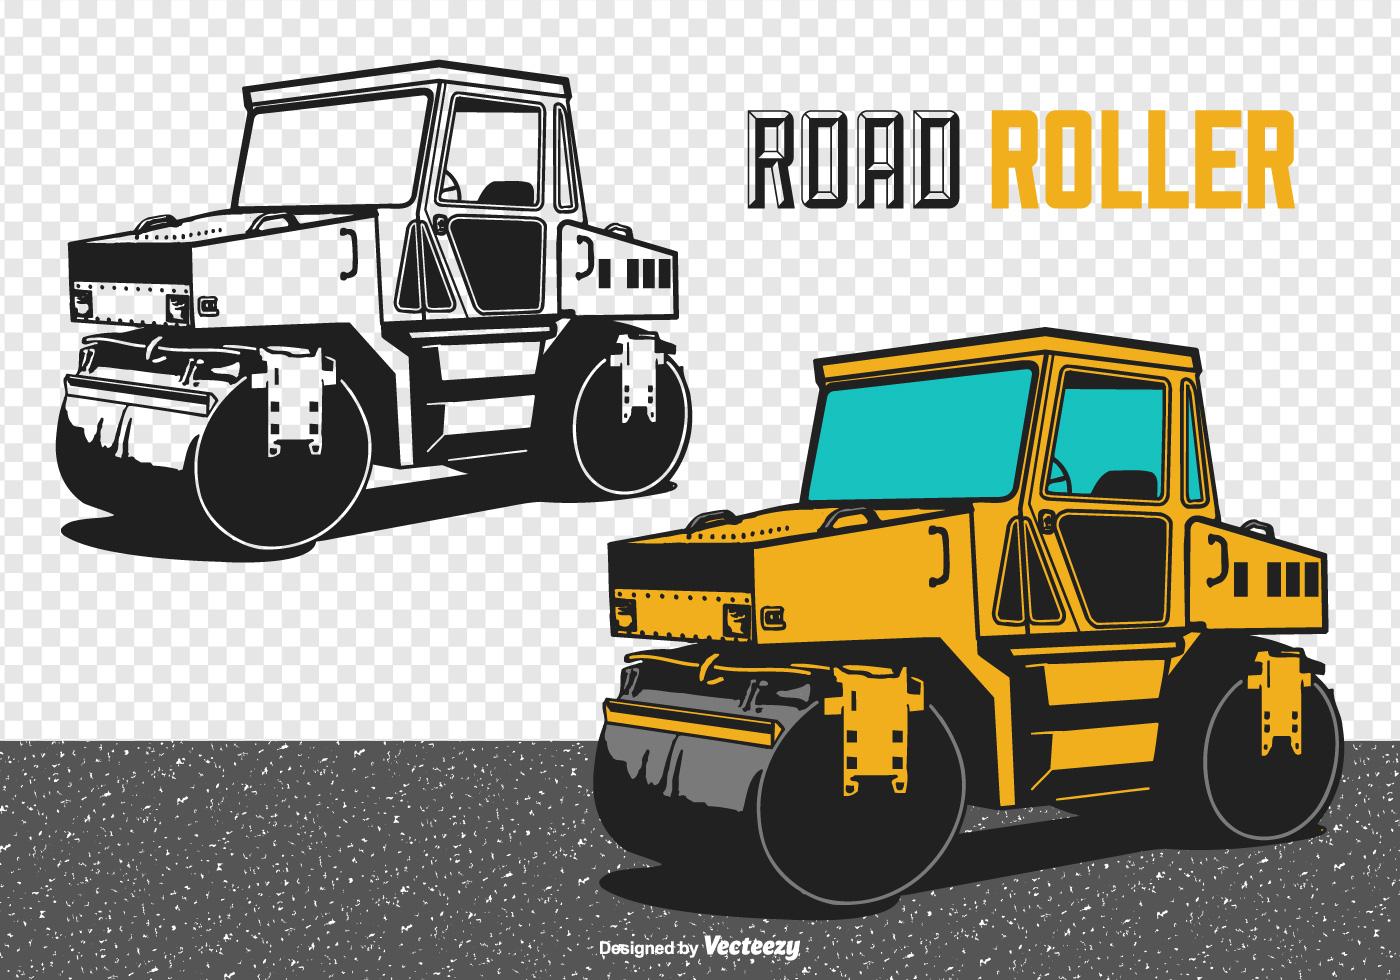 Road Roller Vector Illustration - Download Free Vectors ...